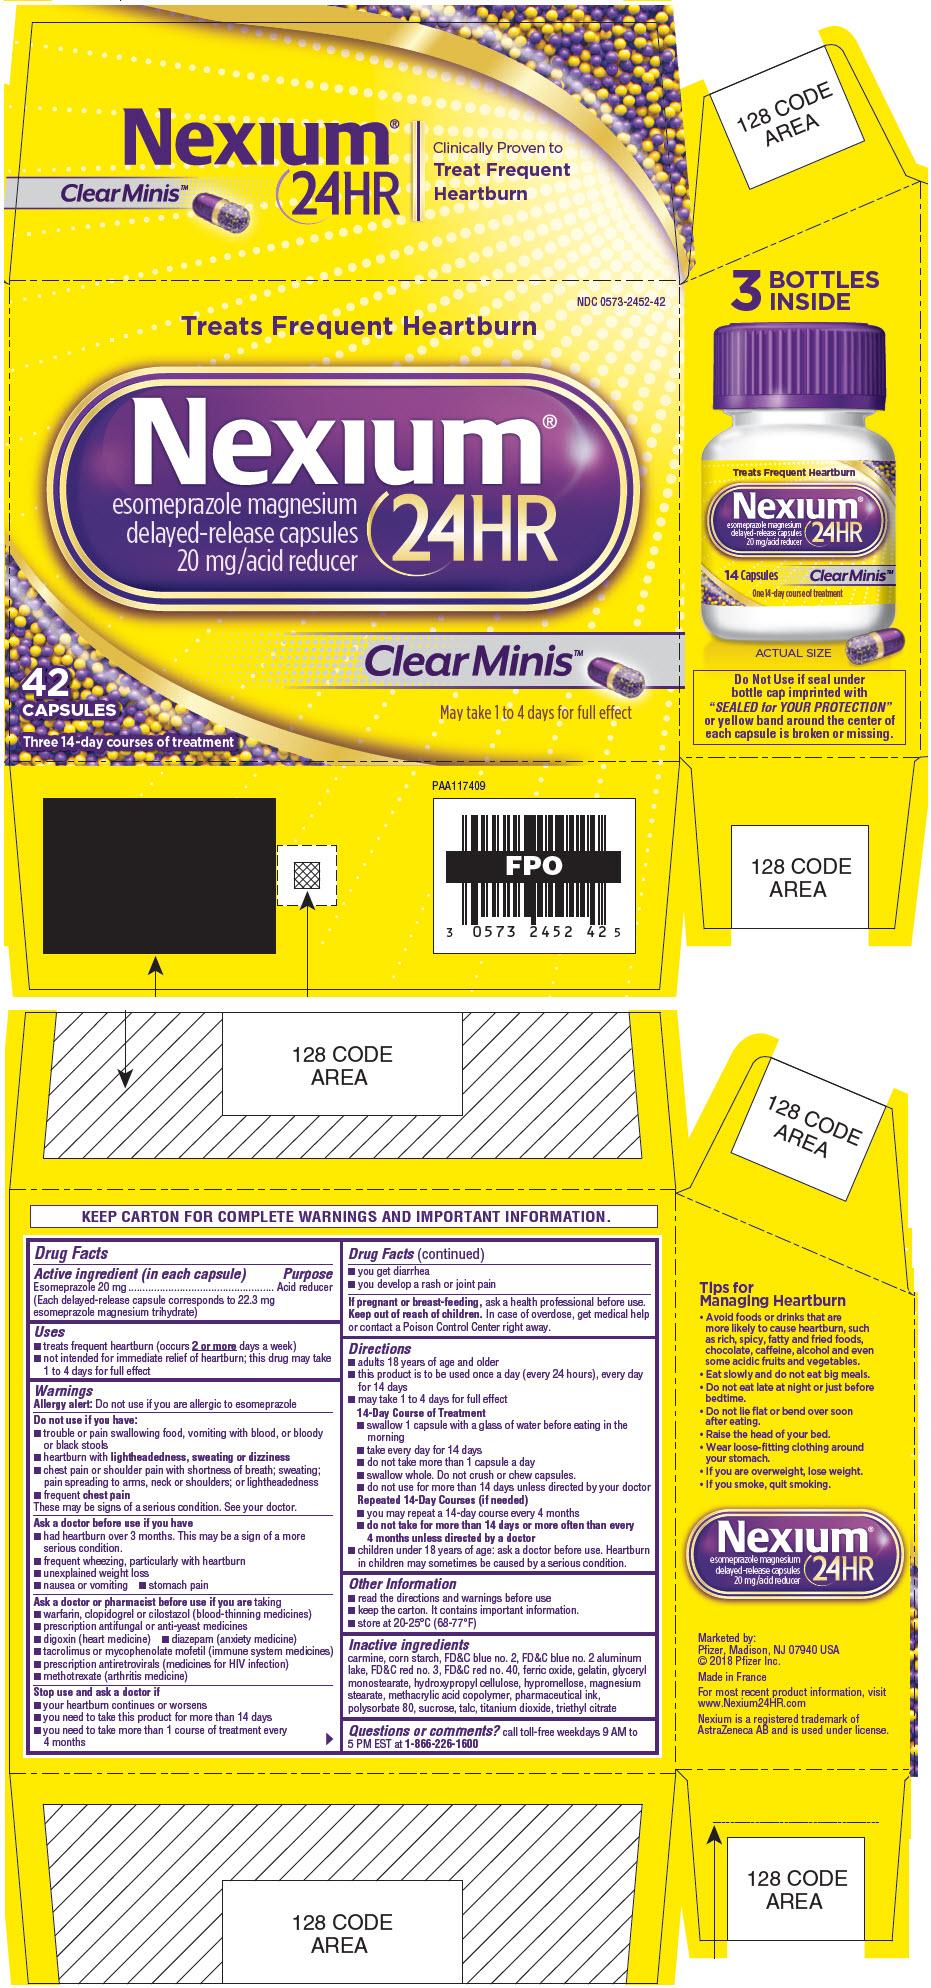 PRINCIPAL DISPLAY PANEL - 42 Capsule Bottle Carton - Clear Minis